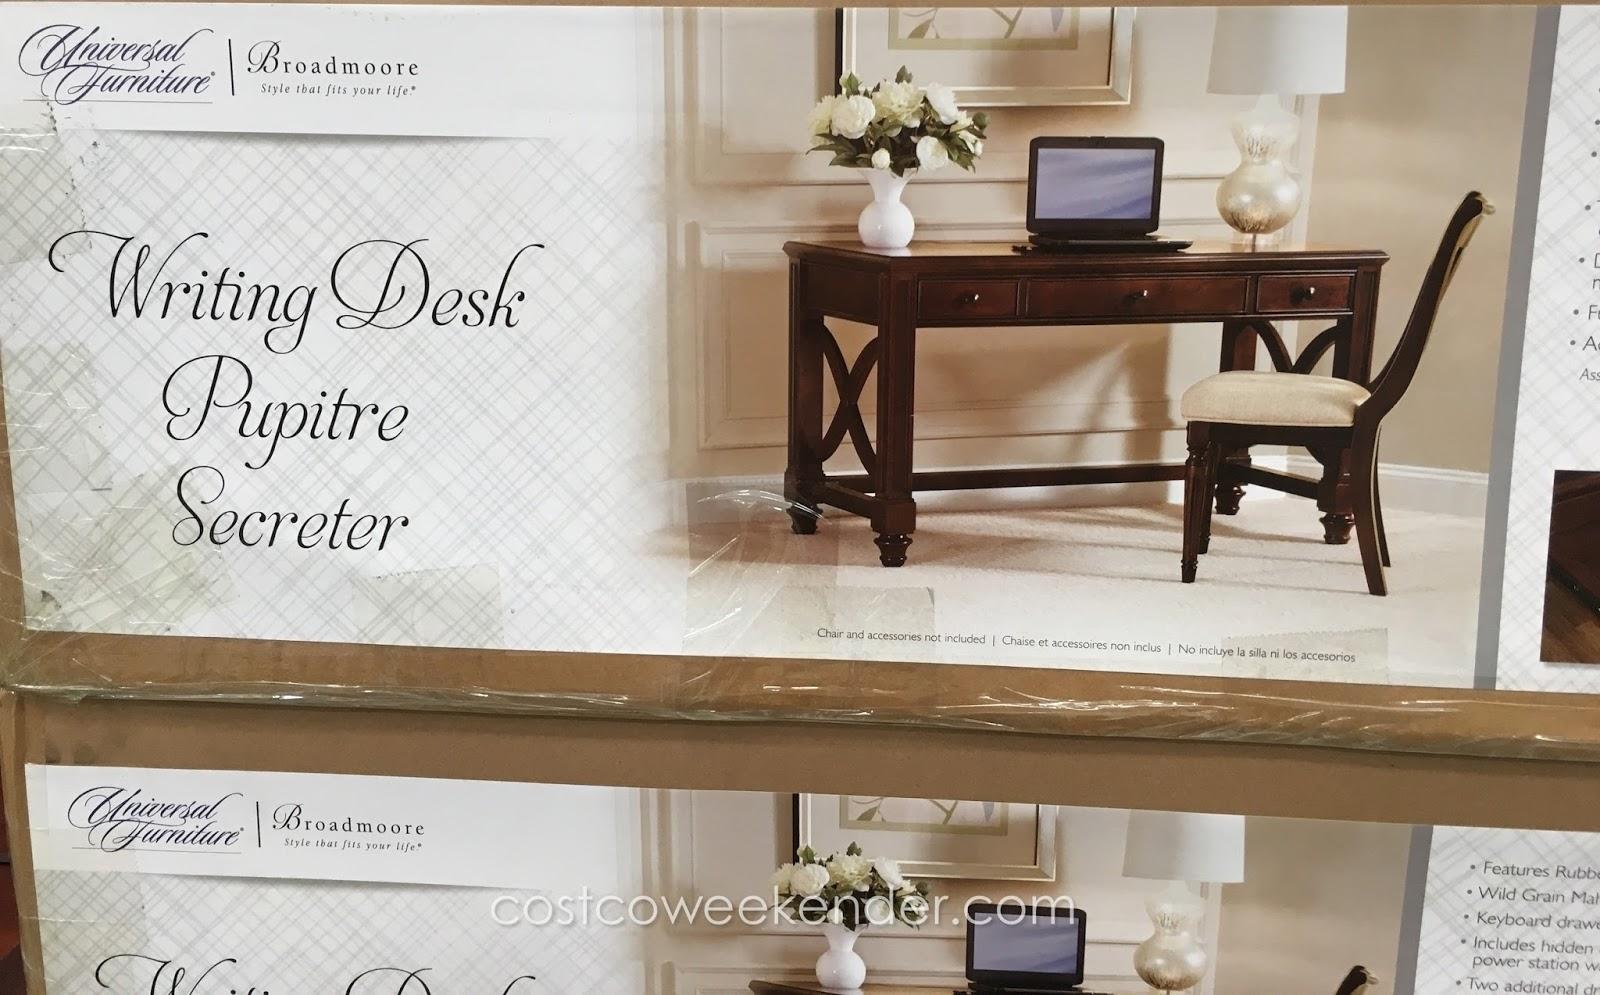 Charmant Universal Furniture Broadmoore Writing Desk: Elegant And Stylish